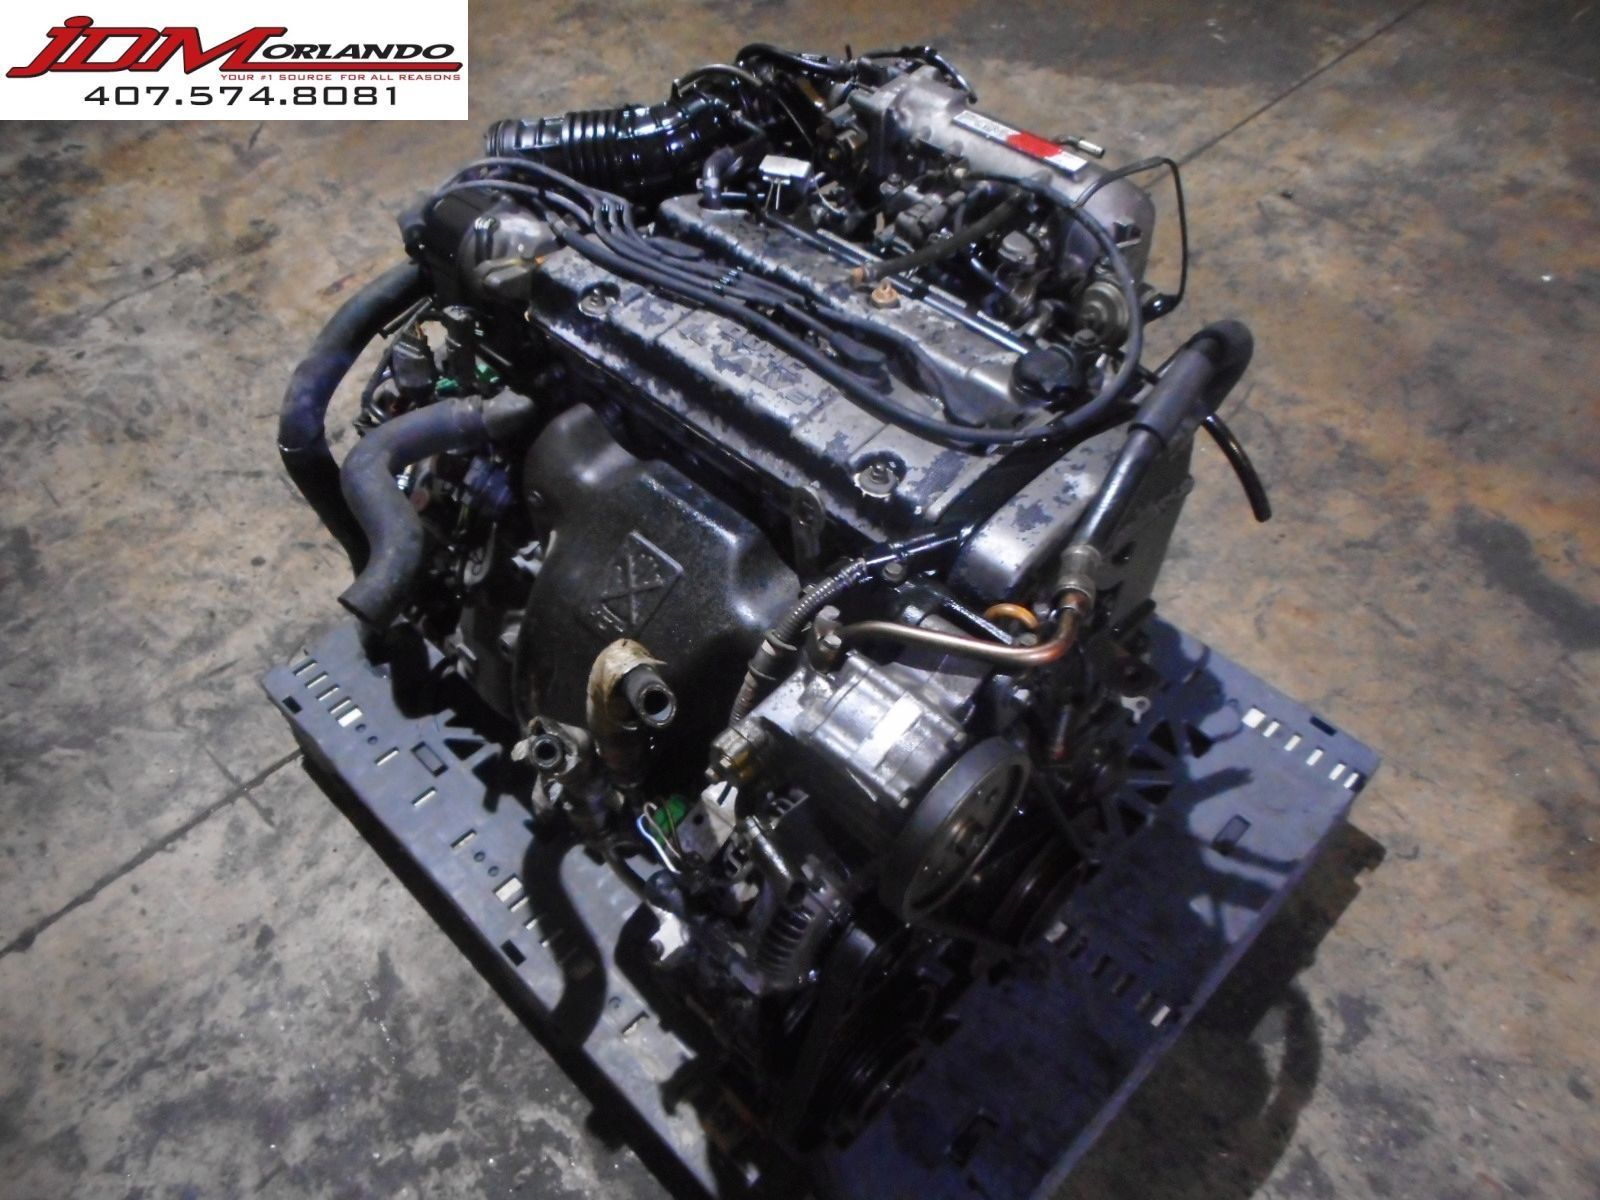 92-95 Honda Accord Prelude 2 3l Dohc Non Vtec Engine & Transmission JDM H23A